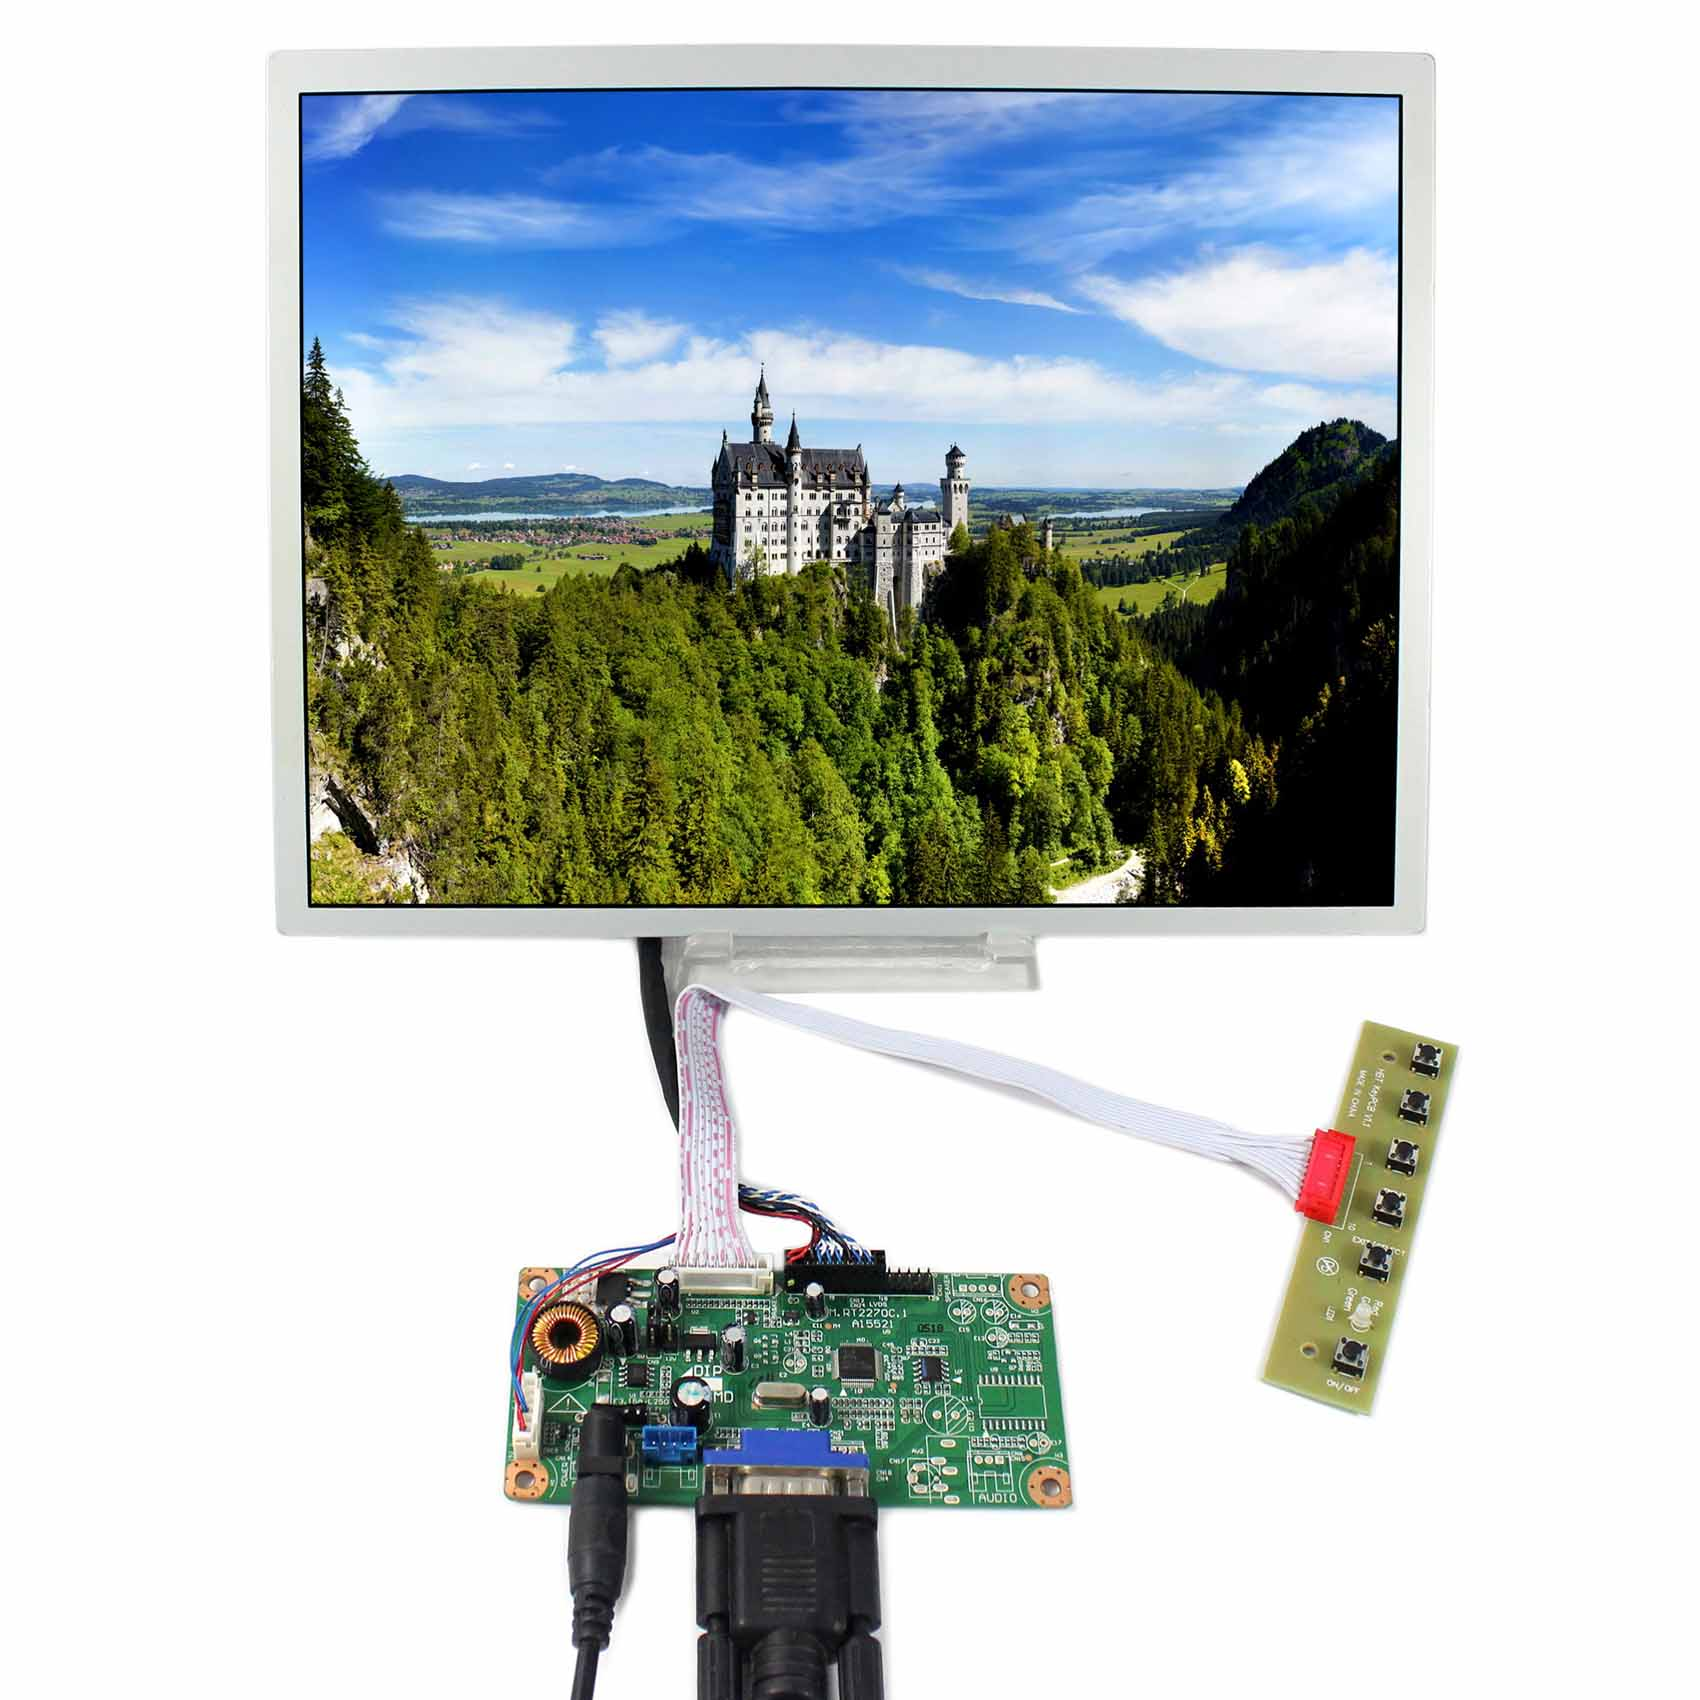 VGA LCD Controller Board With 12.1 LQ121S1LG75 800x600 LCD PanelVGA LCD Controller Board With 12.1 LQ121S1LG75 800x600 LCD Panel